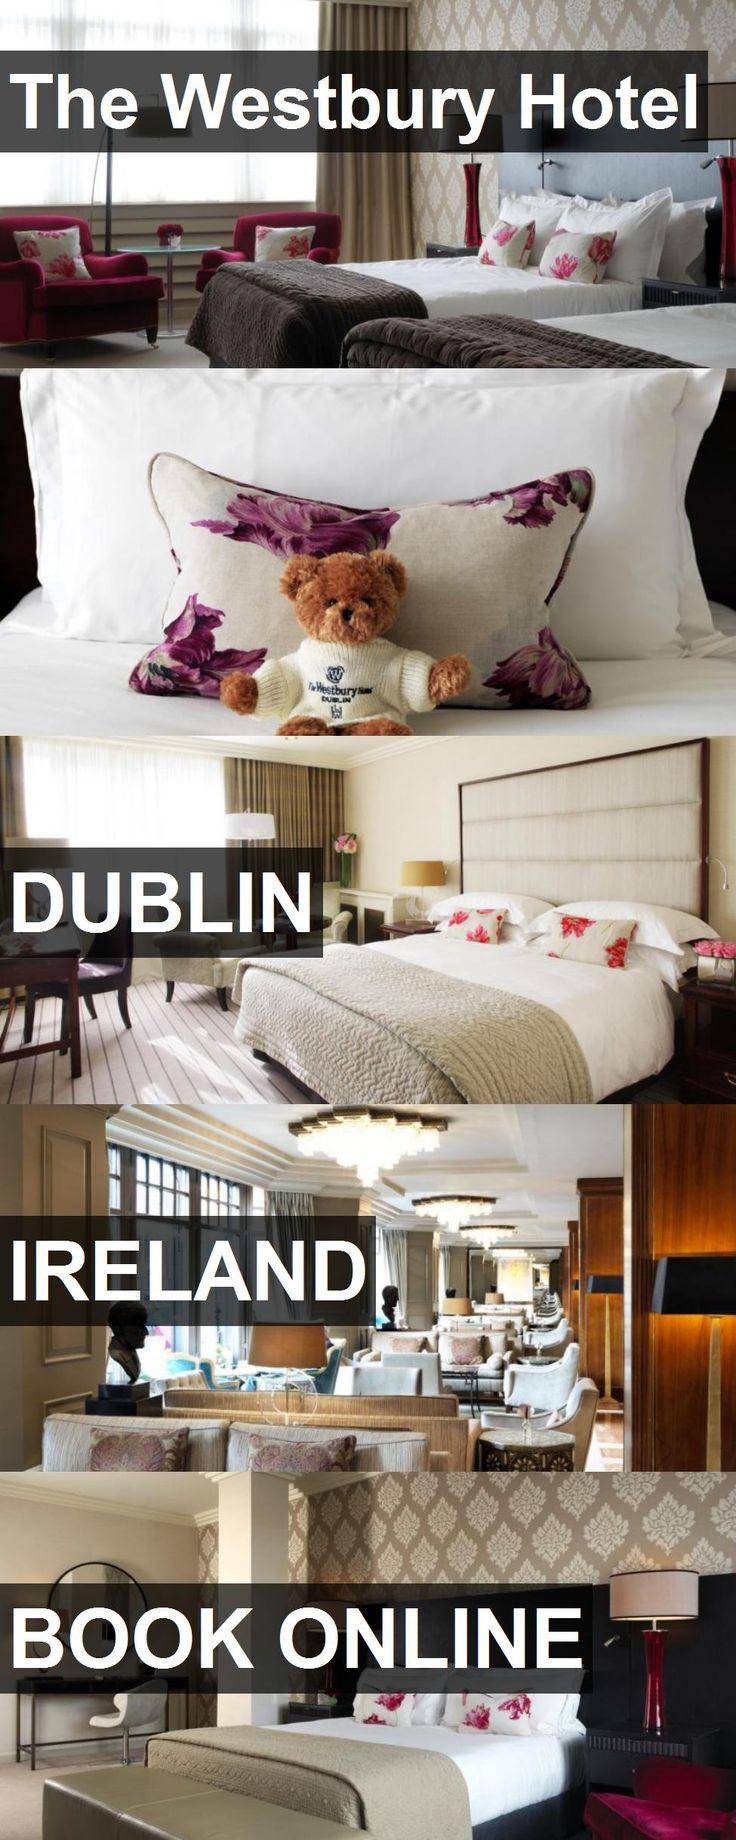 Hotel The Westbury Hotel in Dublin, Ireland. For more